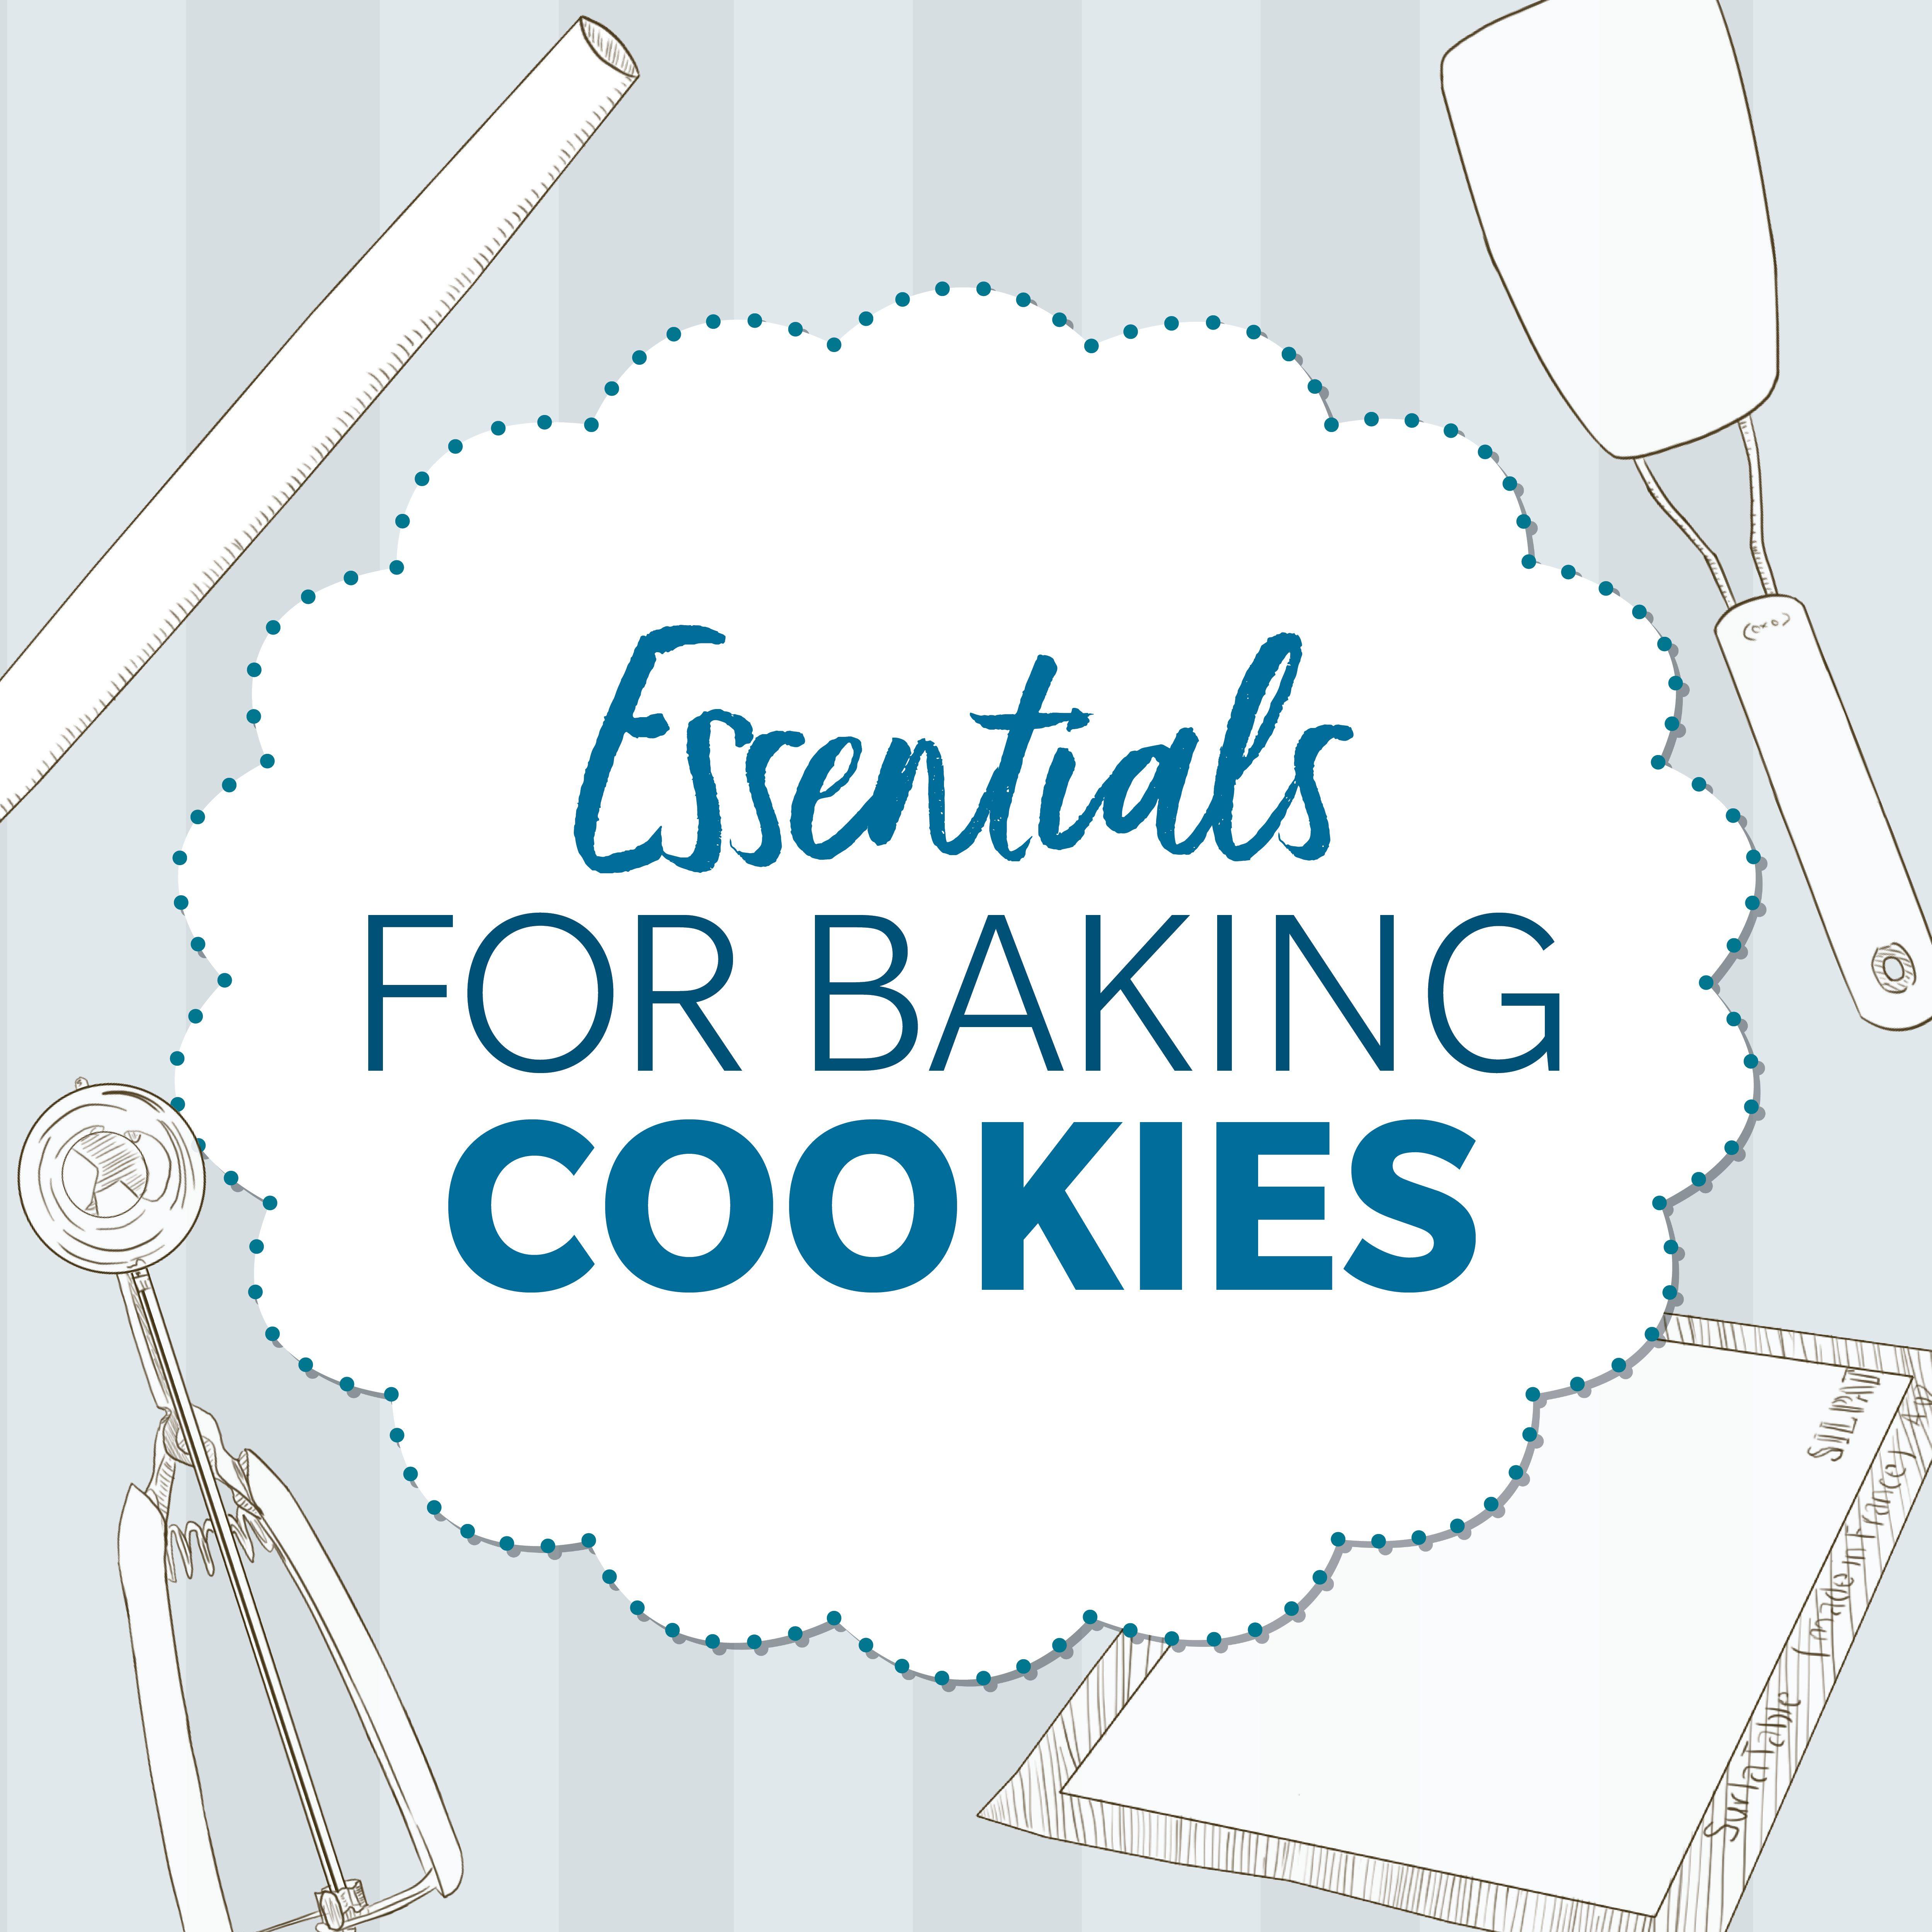 6 Tools You Need to Make Baking Cookies Easier